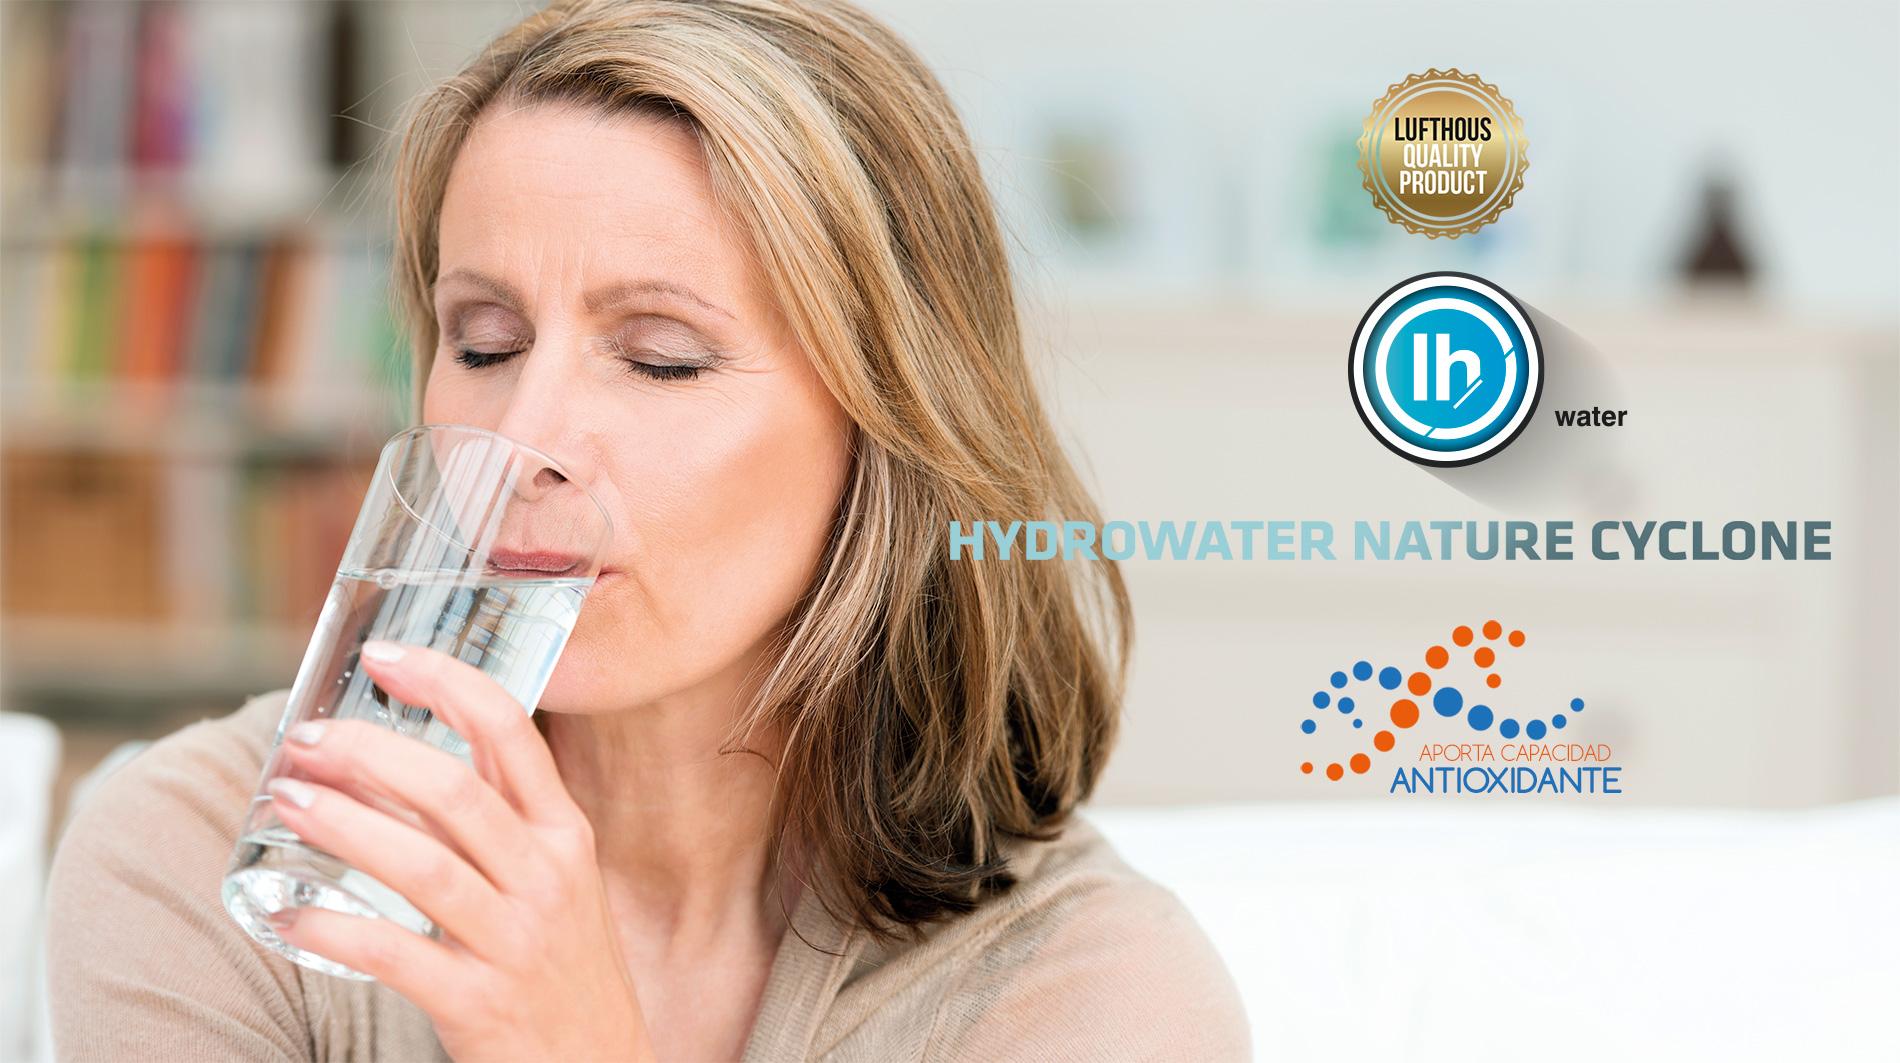 LUFTHOUS - PRODUCTOS LUFTHOUS - HYDROWATER NATURE CYCLONE - ANTIOXIDANTE - H2O - AGUA HIDROGENADA